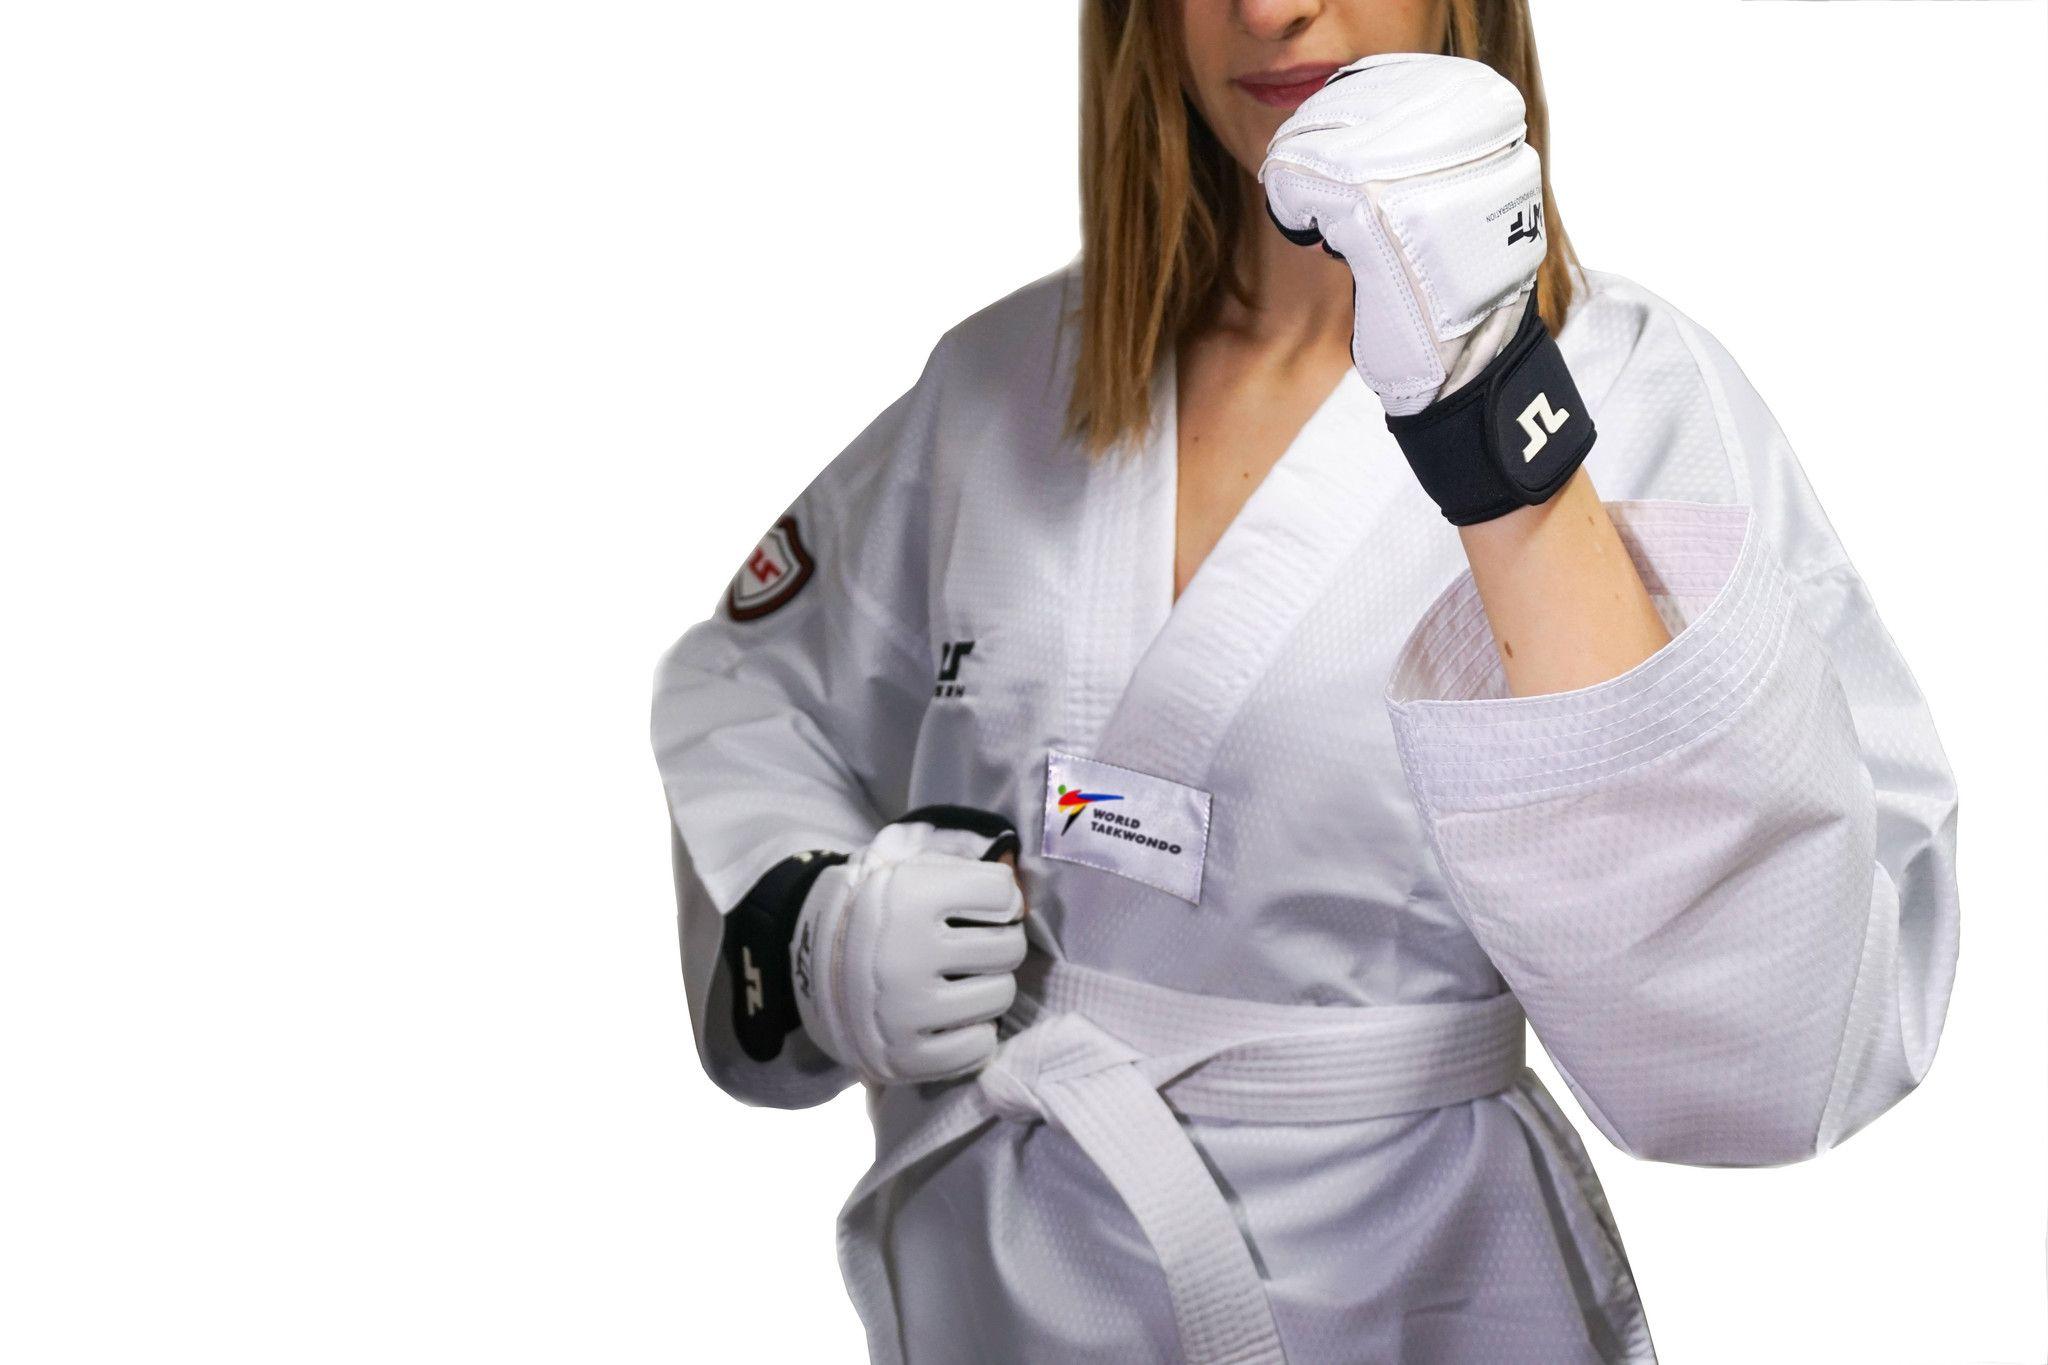 Tusah - Dobok EasyFit Fighter Ultraleggero per Taekwondo Omologato WT collo Bianco